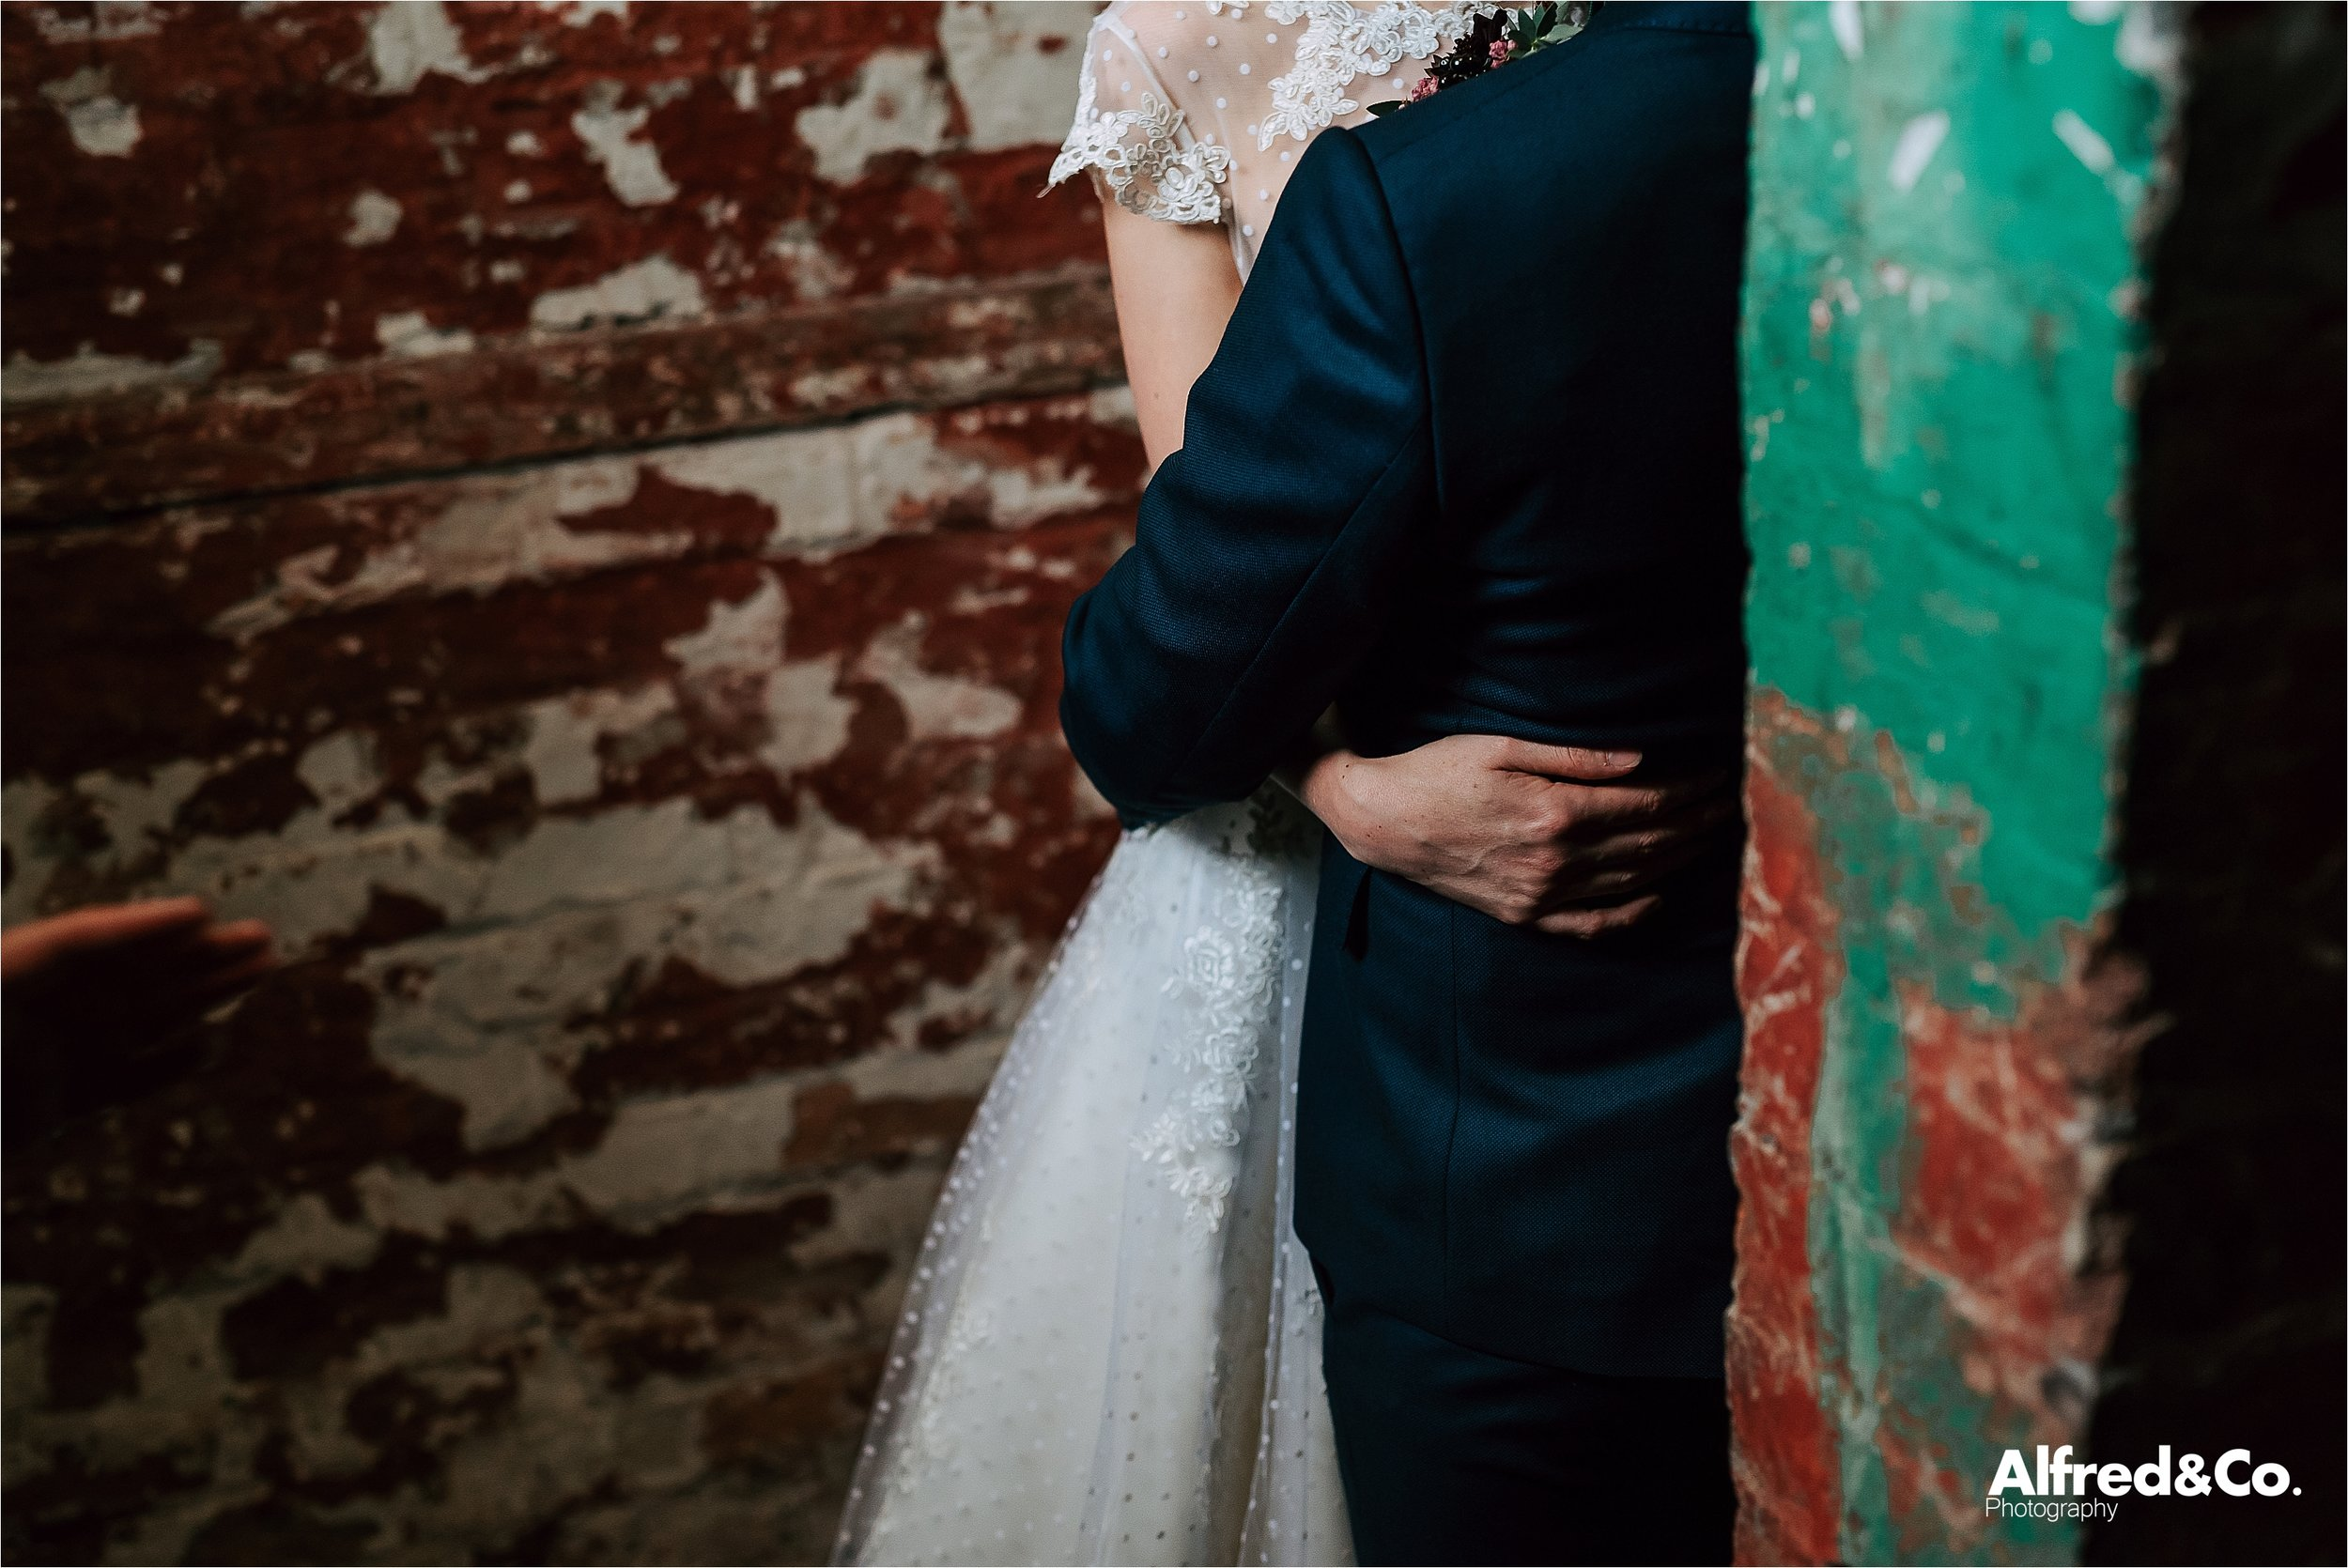 holmesmill+wedding+clitheroe+photographer+rustic+lancashire17.jpg